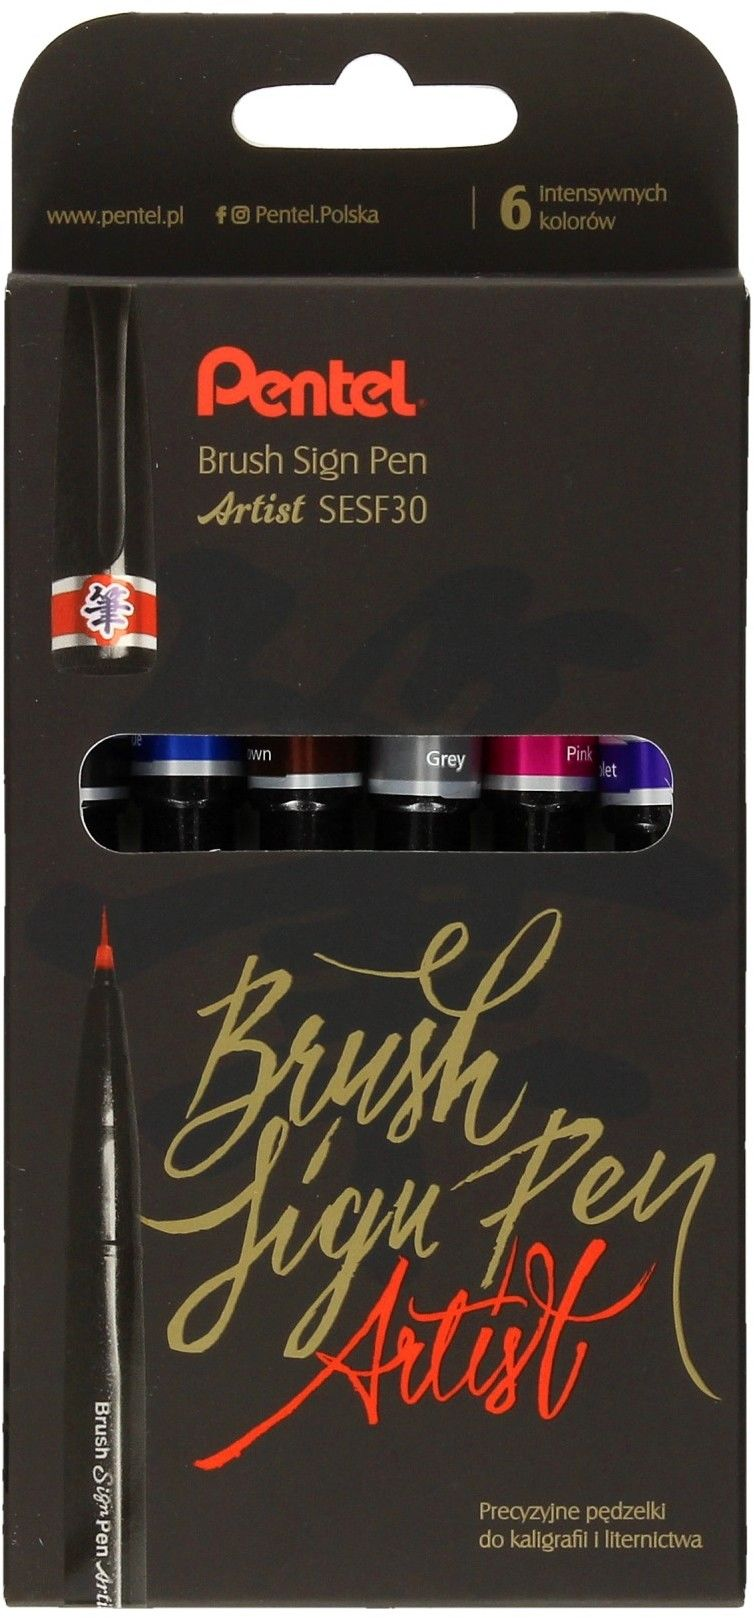 Pisaki pędzelkowe do kaligrafii i liternictwa BRUSH SIGN PEN ARTIST PENTEL 6szt. /SESF30C-ST6ACENPVPL/